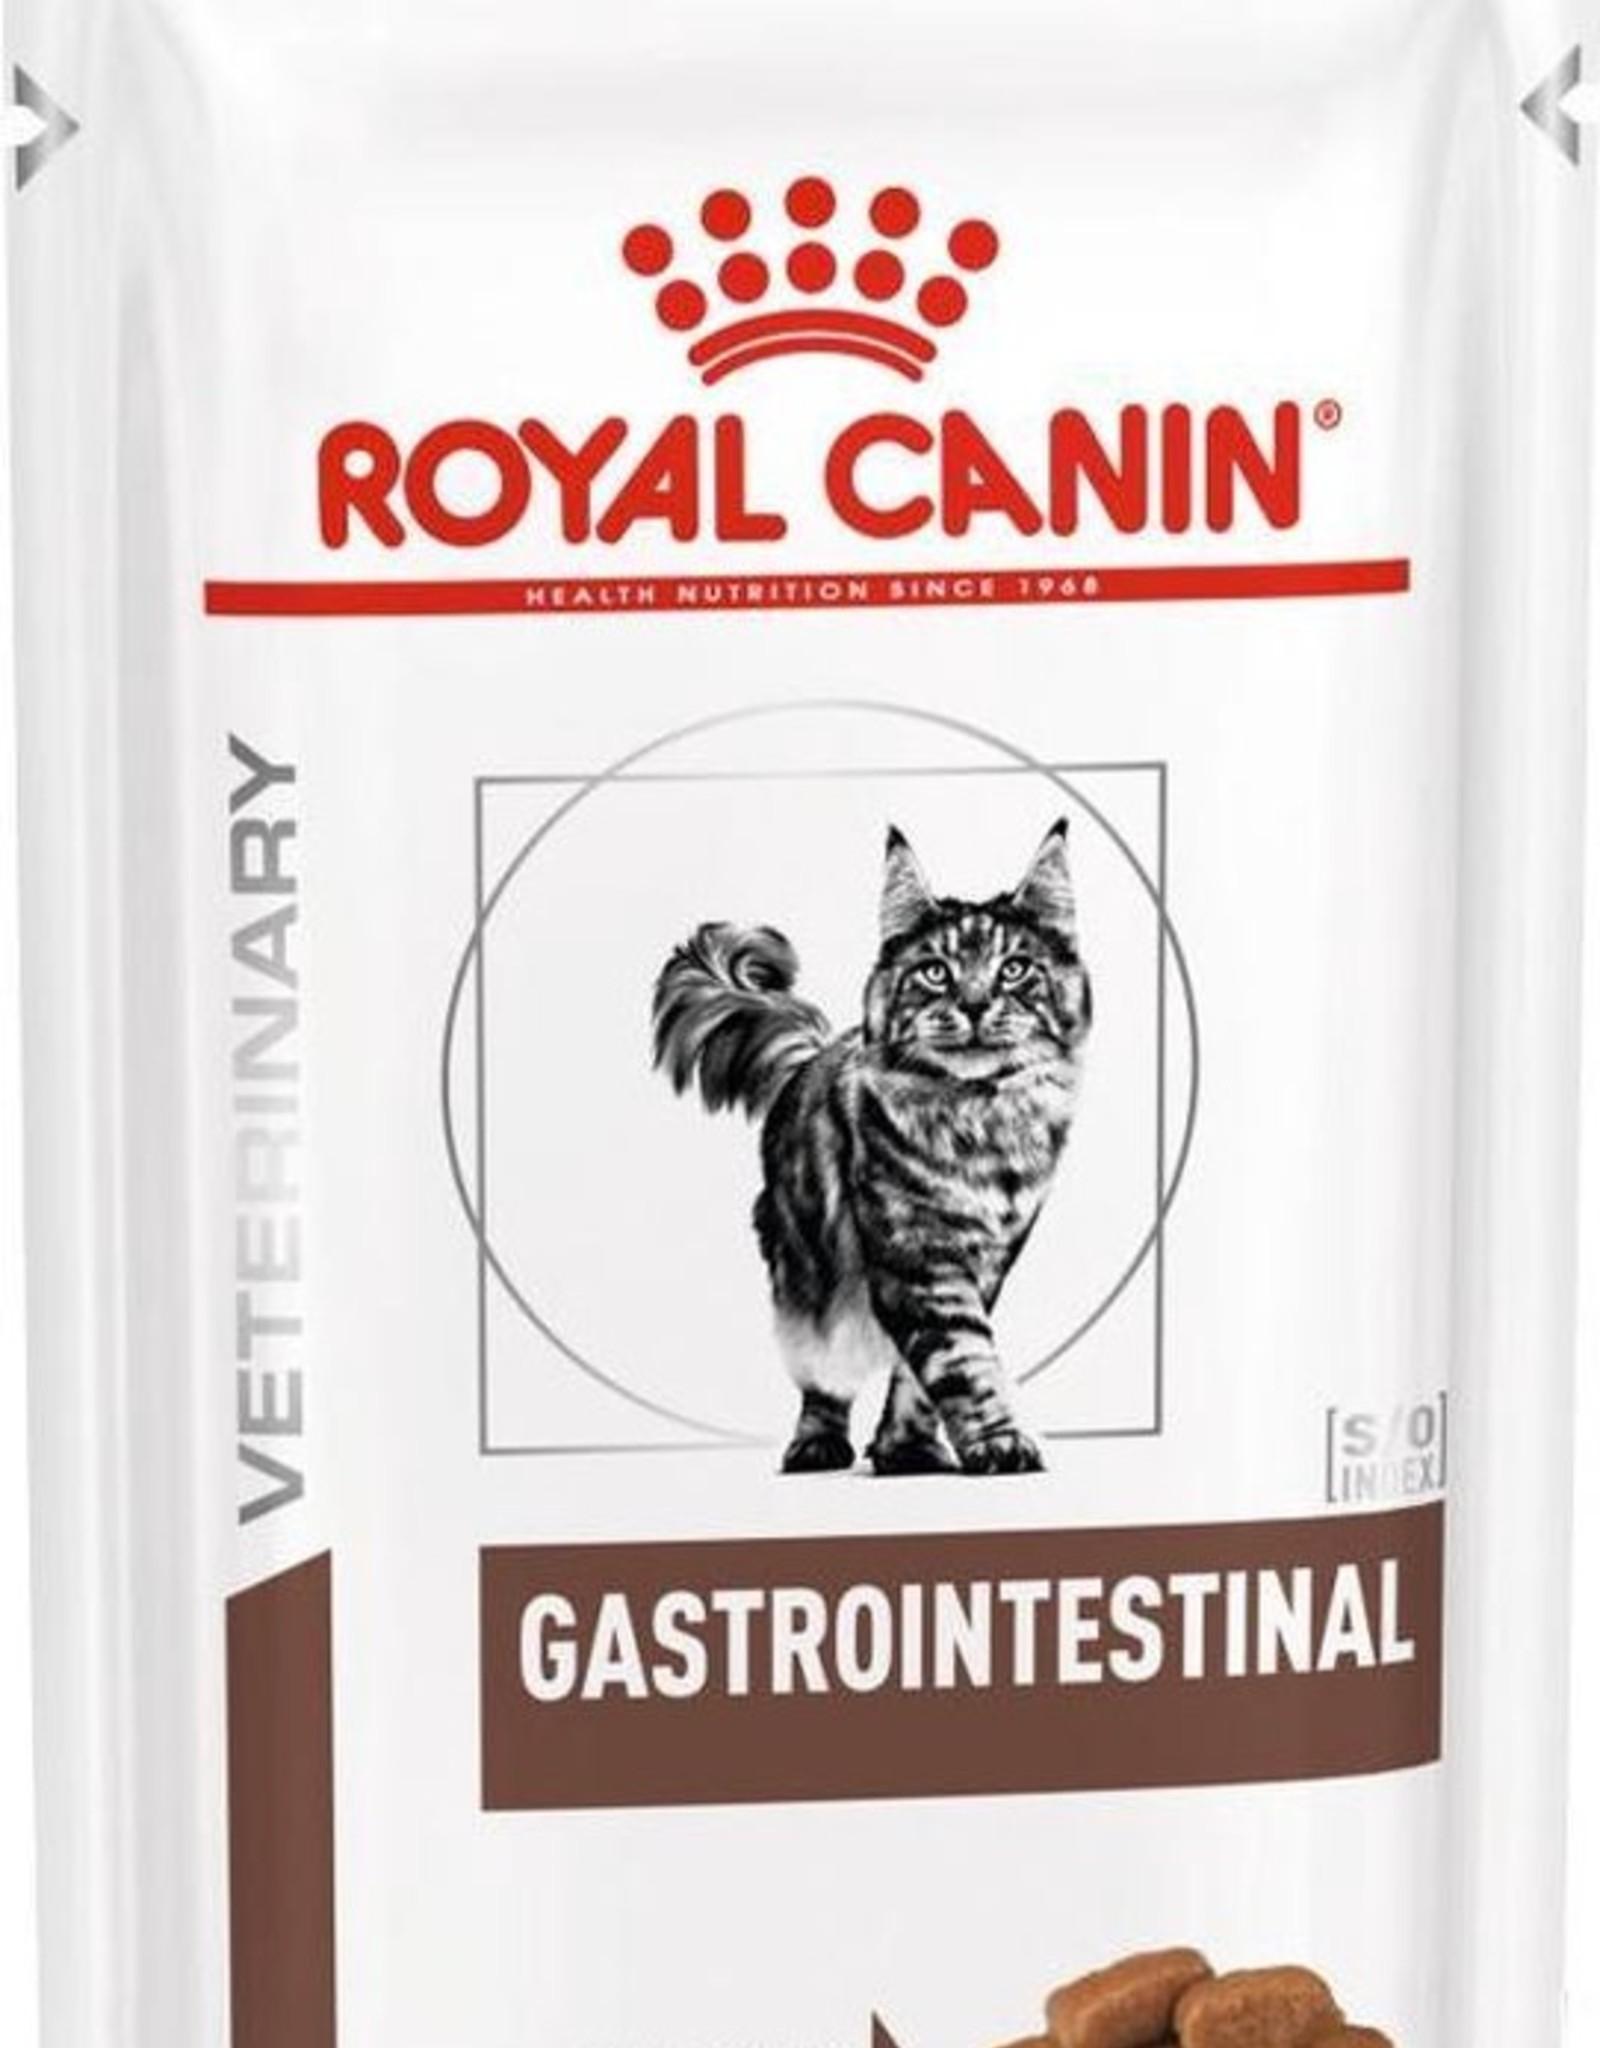 Royal Canin Royal Canin Gastro Intestinal Cat 12x85gr (pouch)